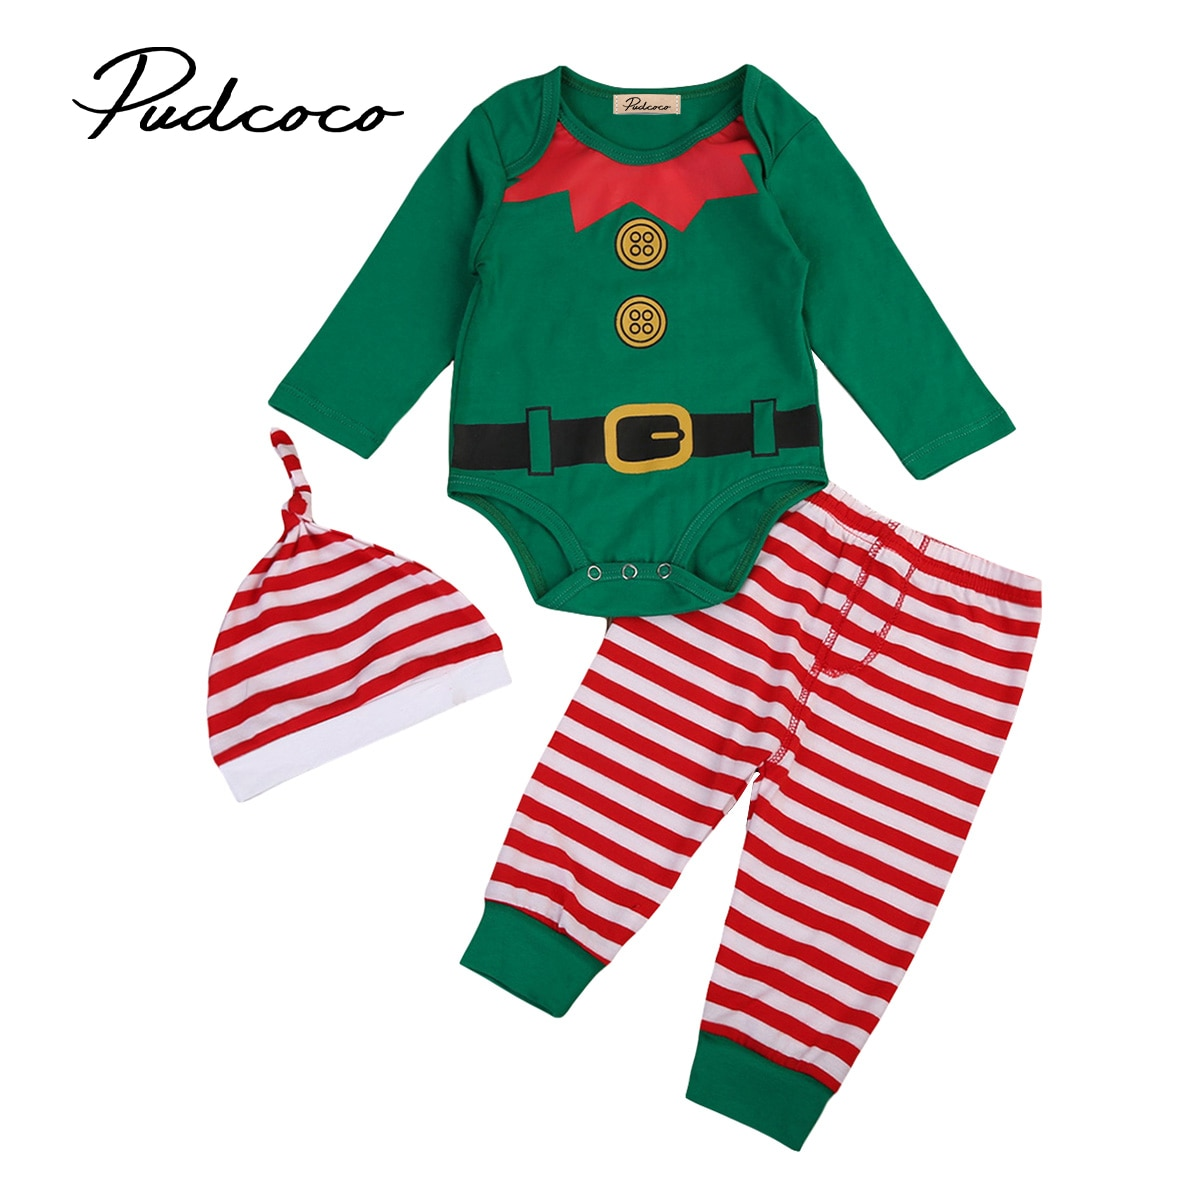 2017 New Year Babies 3 pcs Xmas Clothing Set Newborn Baby Boys Girls Bodysuit Pants Hat Outfits Set Christmas Clothes 0-24M